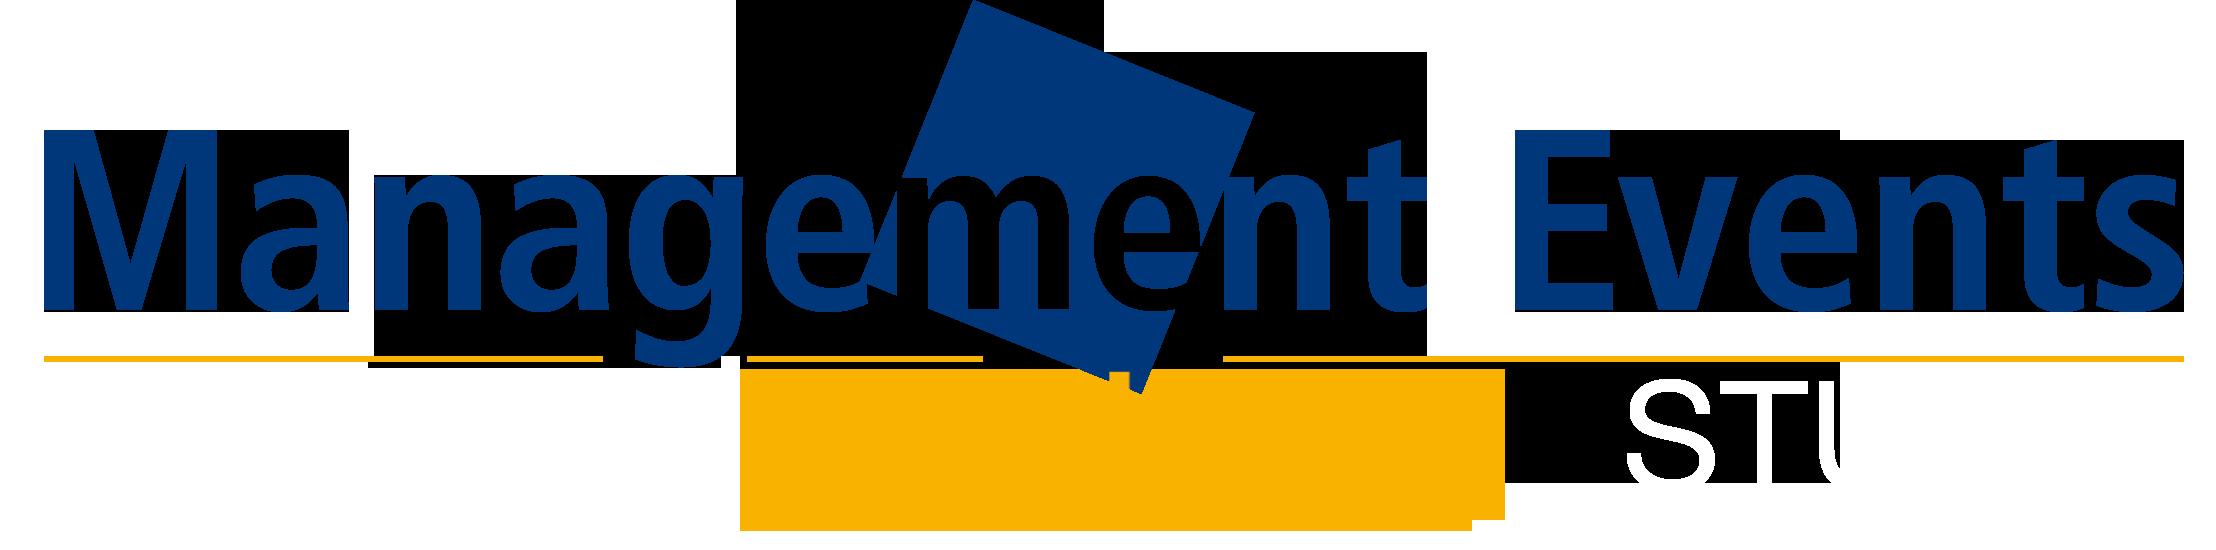 ME_Studio_logo2-4.png